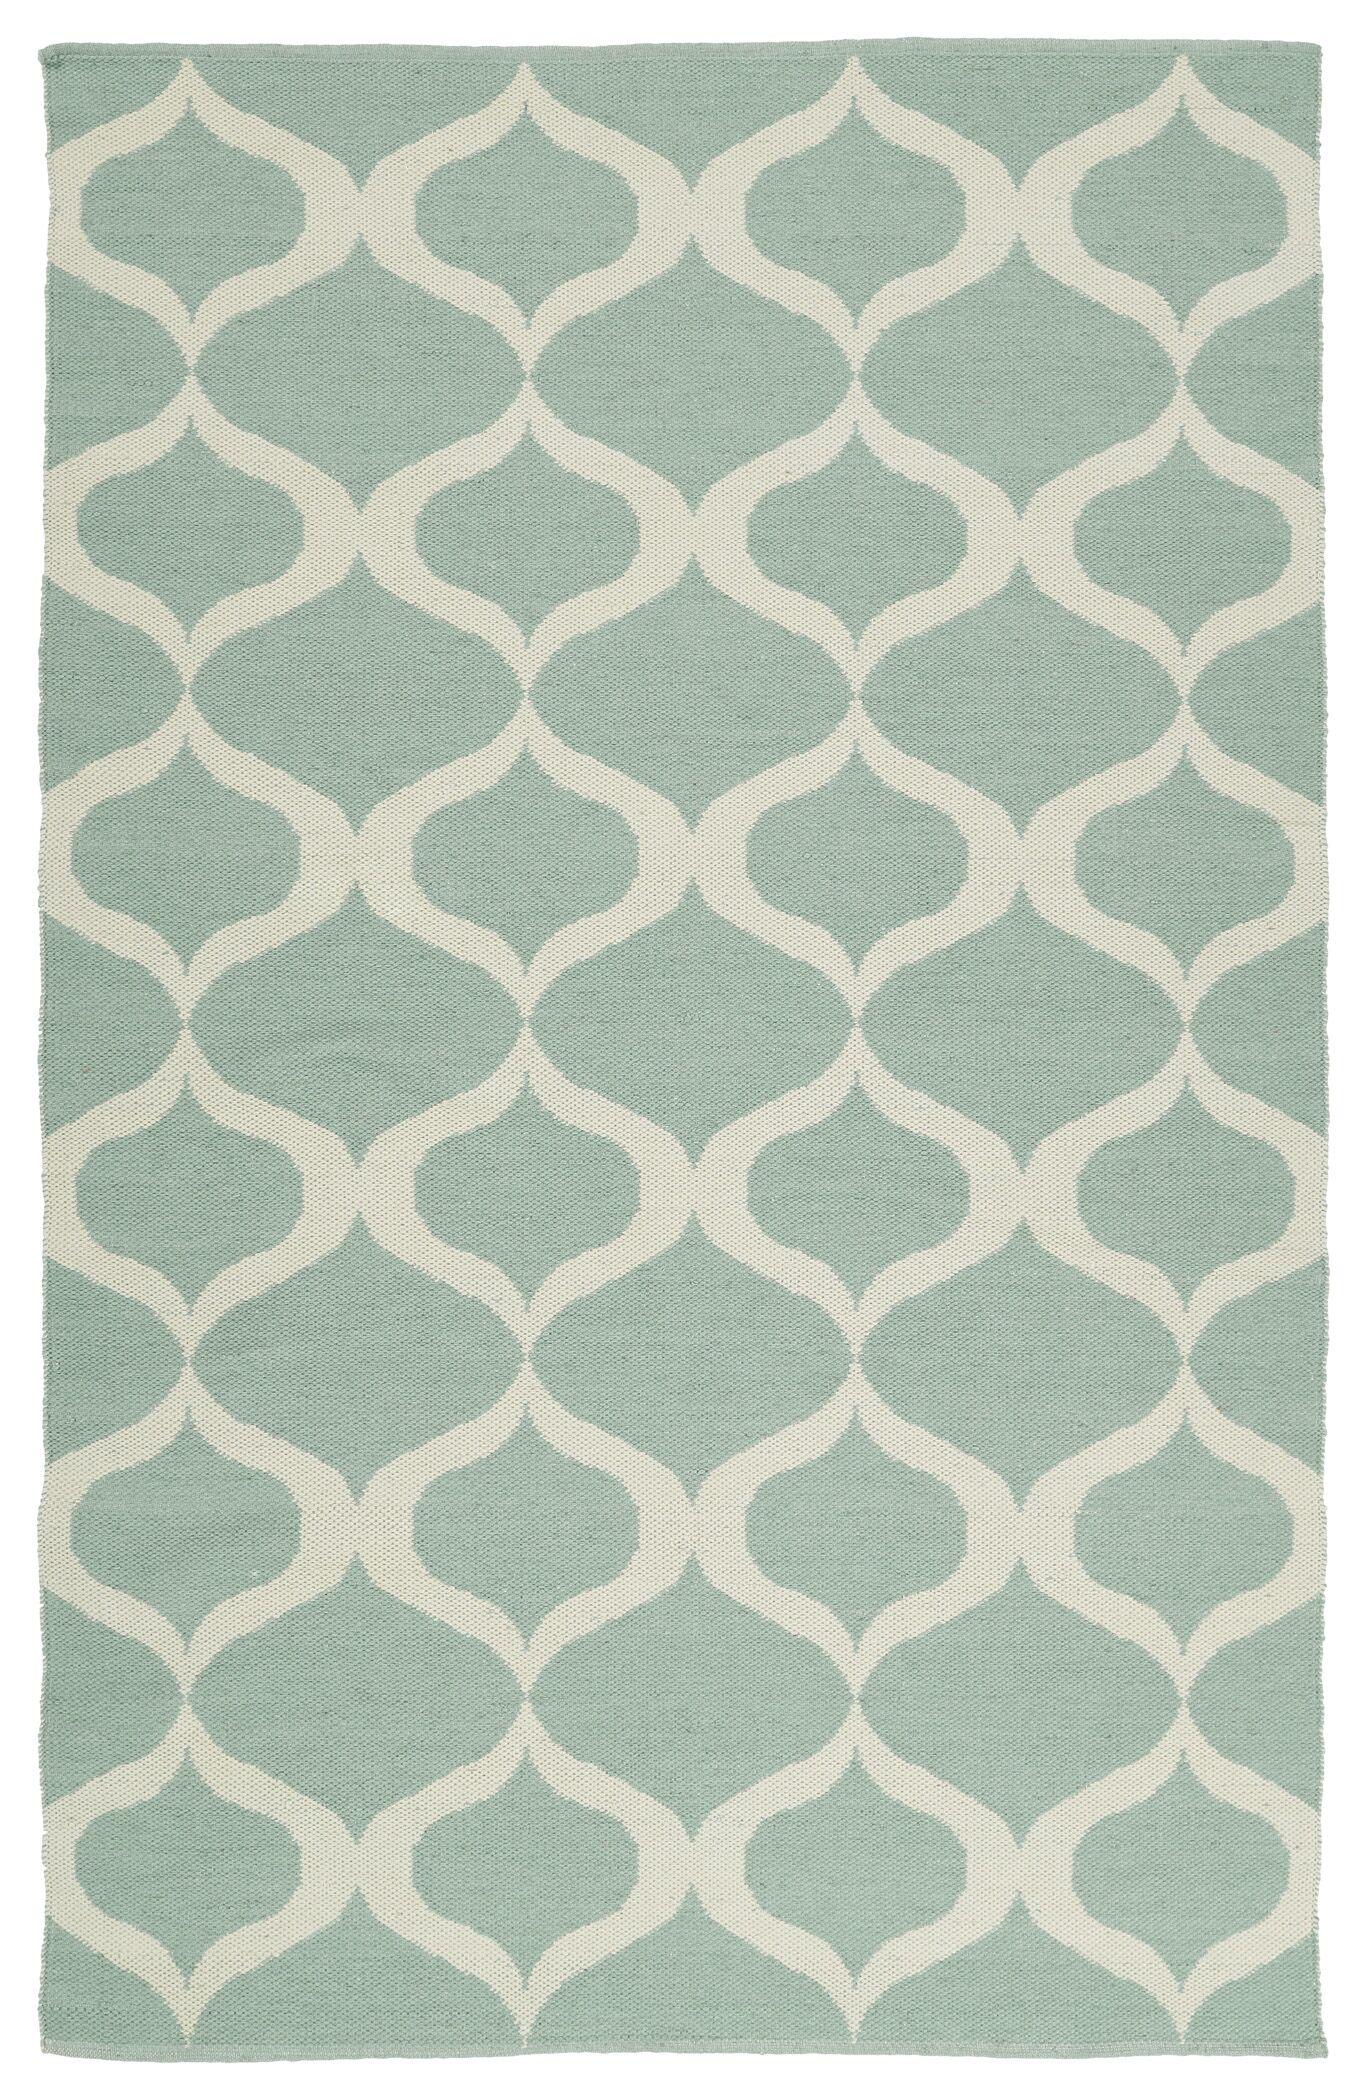 Dominic Mint/Cream Indoor/Outdoor Area Rug Rug Size: Rectangle 5' x 7'6